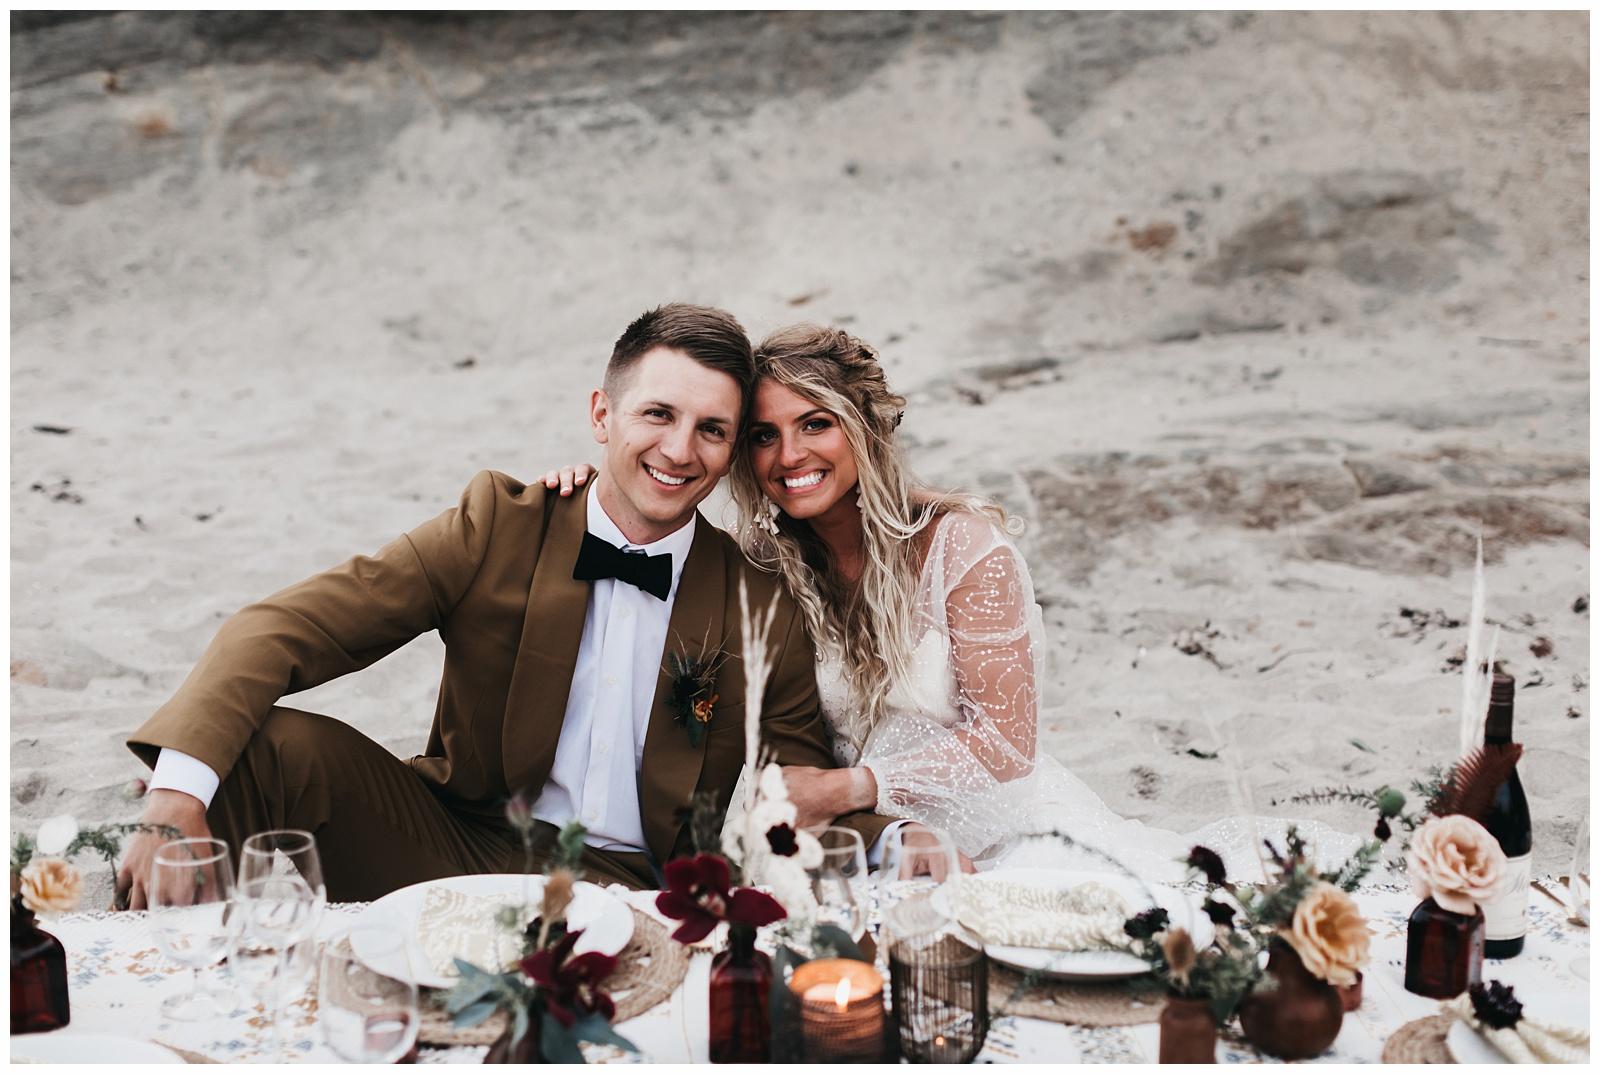 portland-wedding-photographer-pacific-city-elopement-photographer-anniezav_0055.jpg